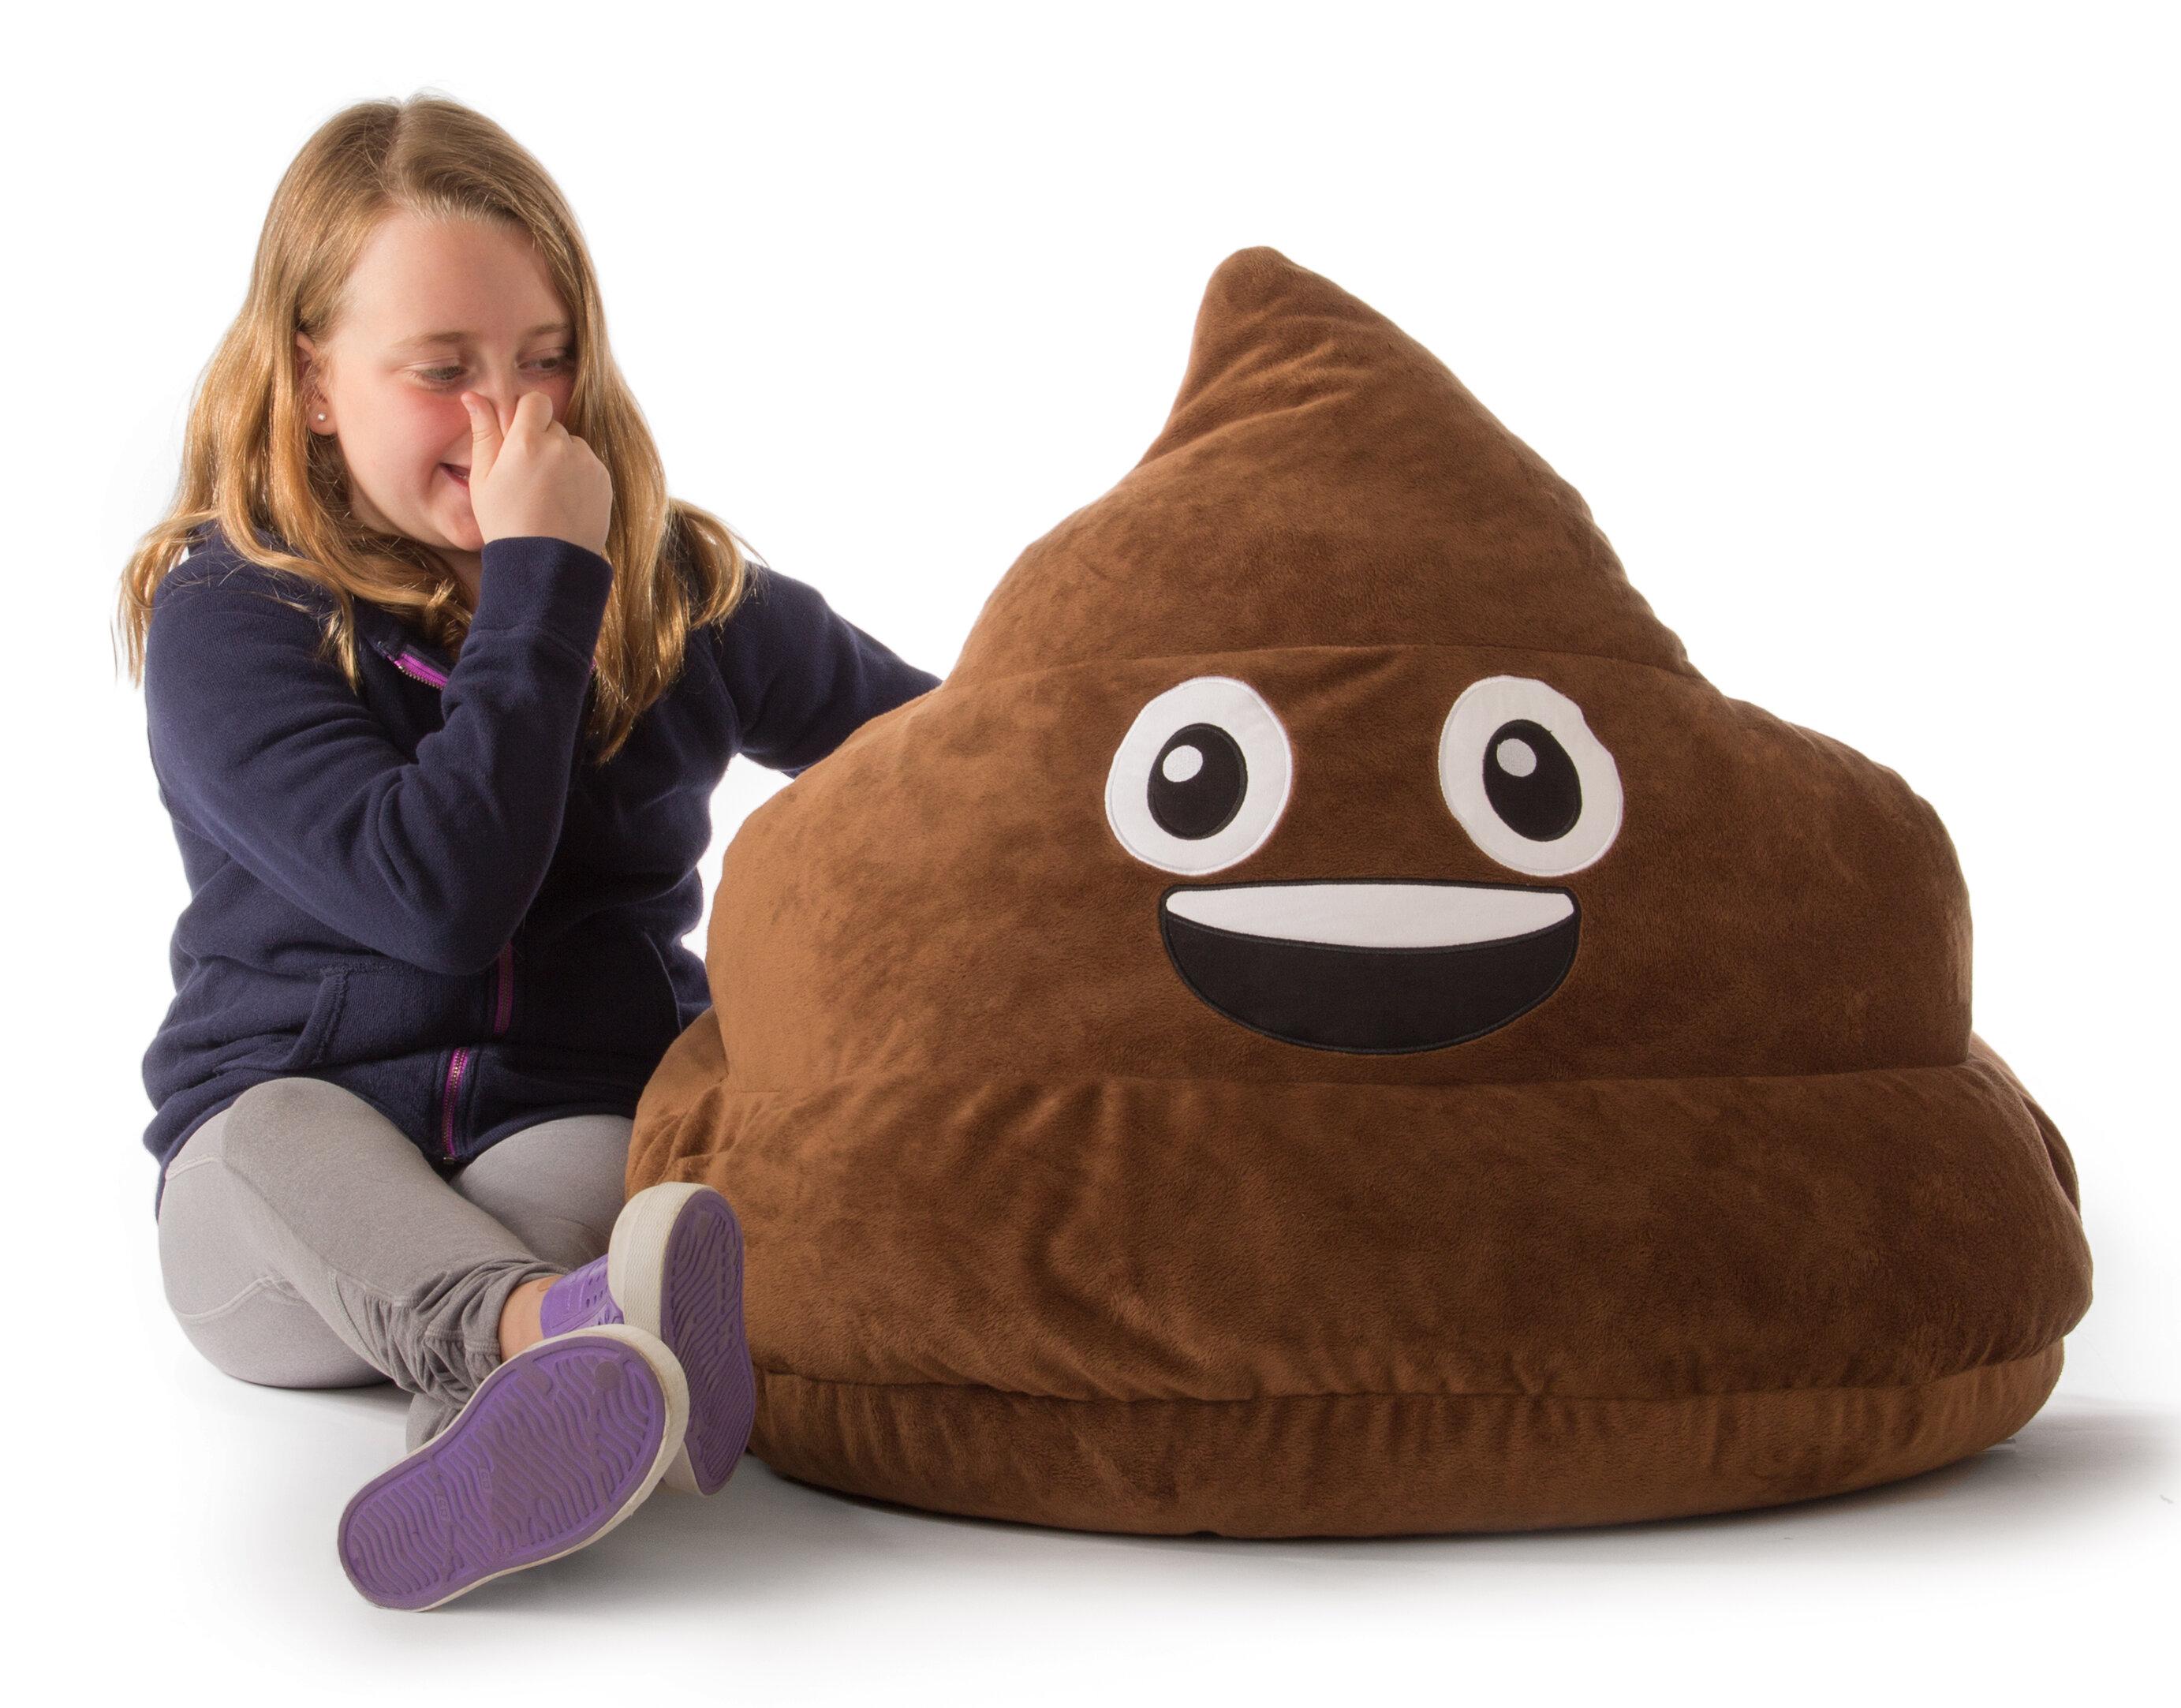 Ace Casual Furniture GoMoji Emoji Poo Bean Bag Chair U0026 Reviews | Wayfair